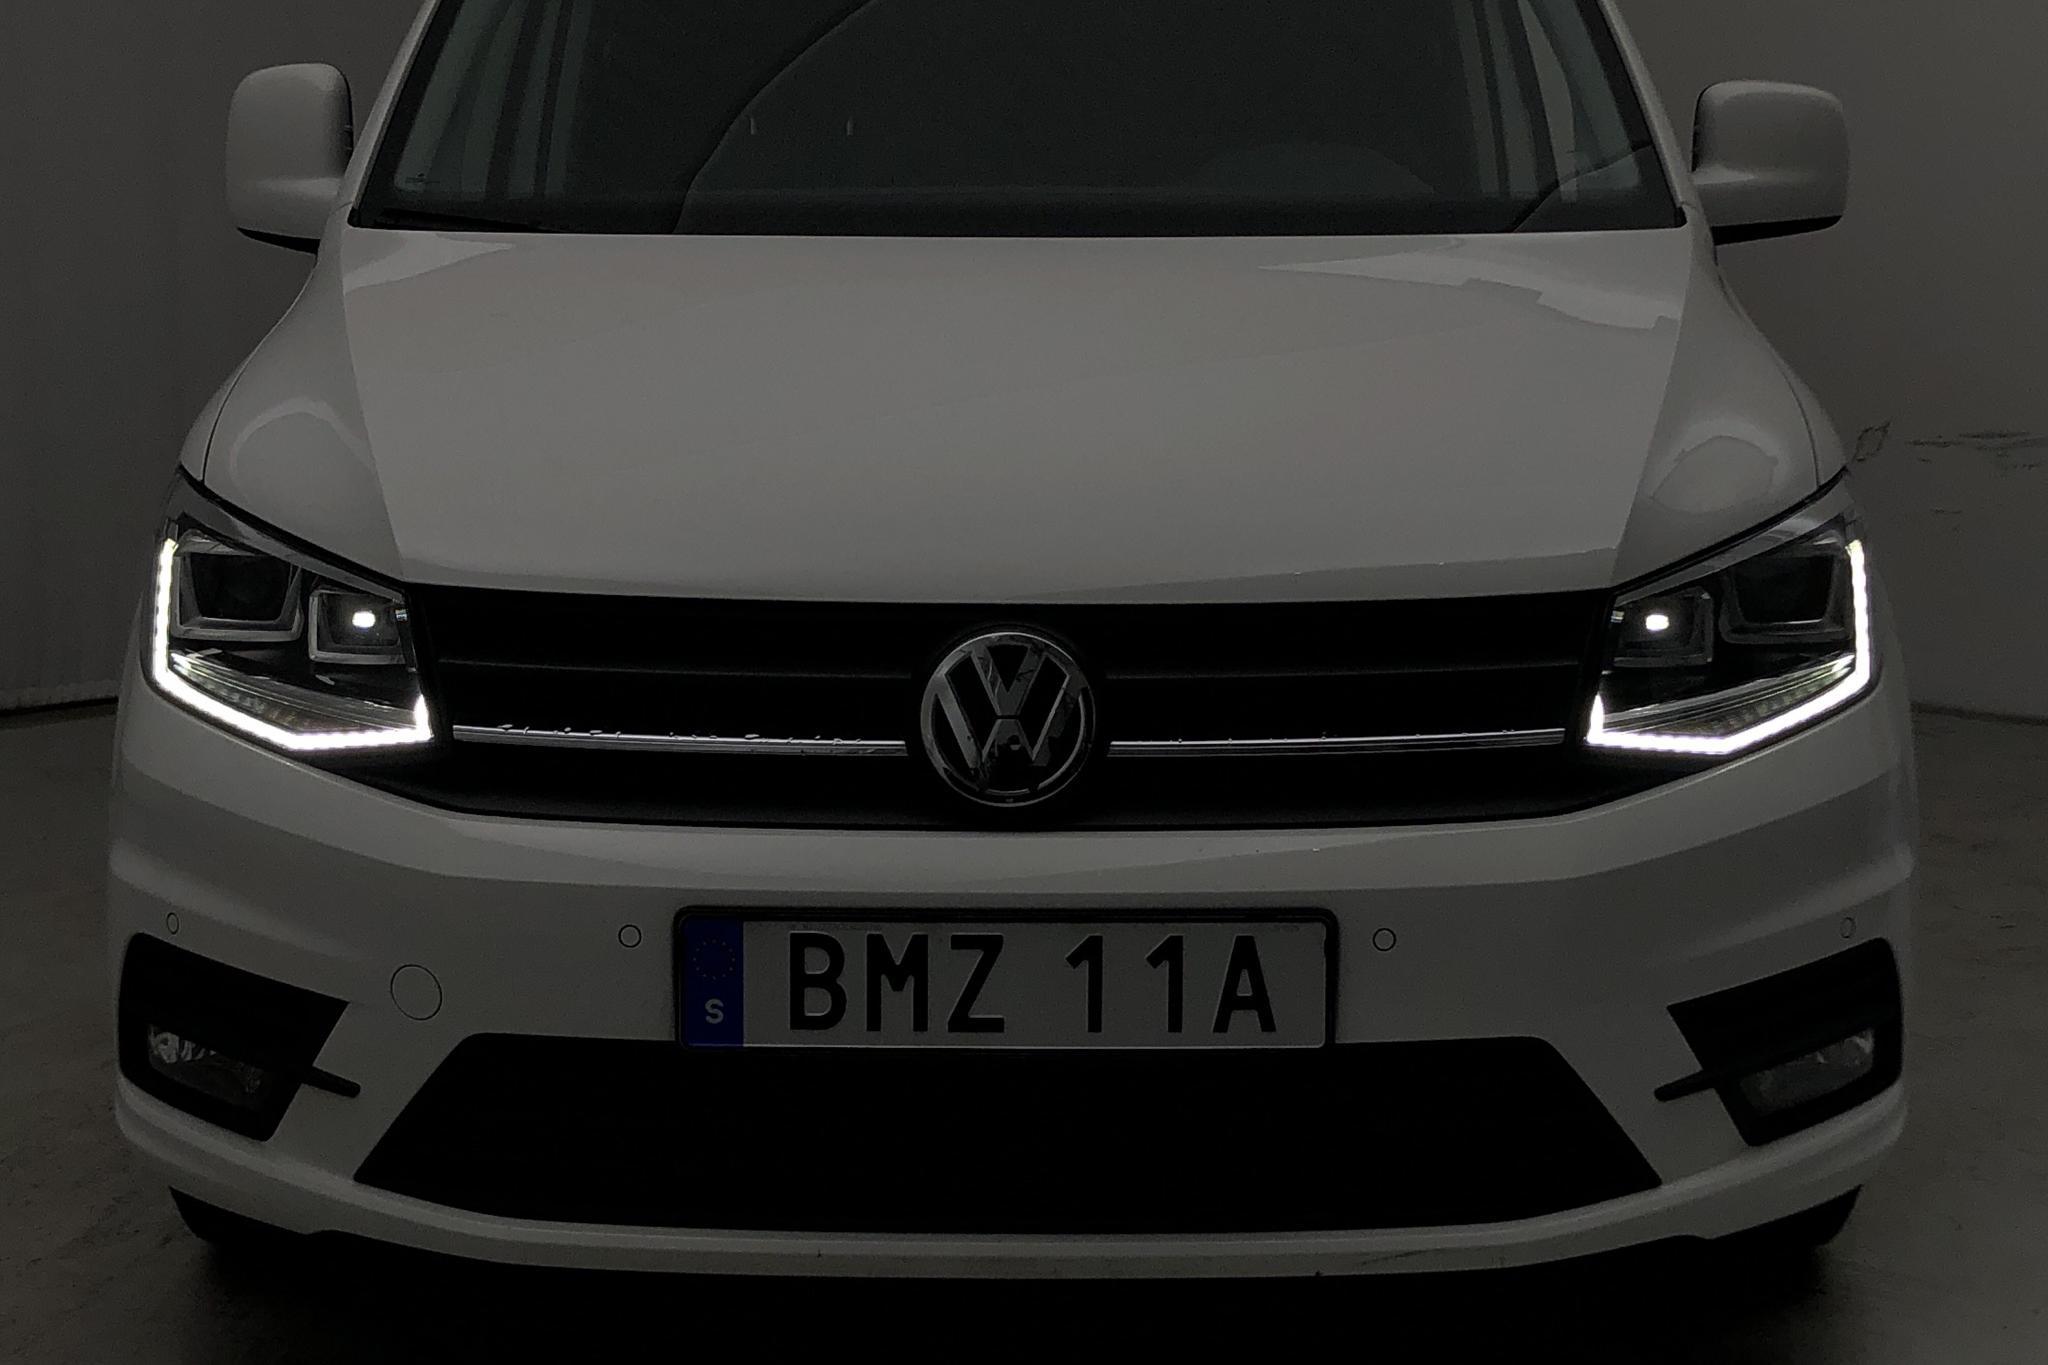 VW Caddy 2.0 TDI Skåp (102hk) - 1 231 mil - Automat - vit - 2020